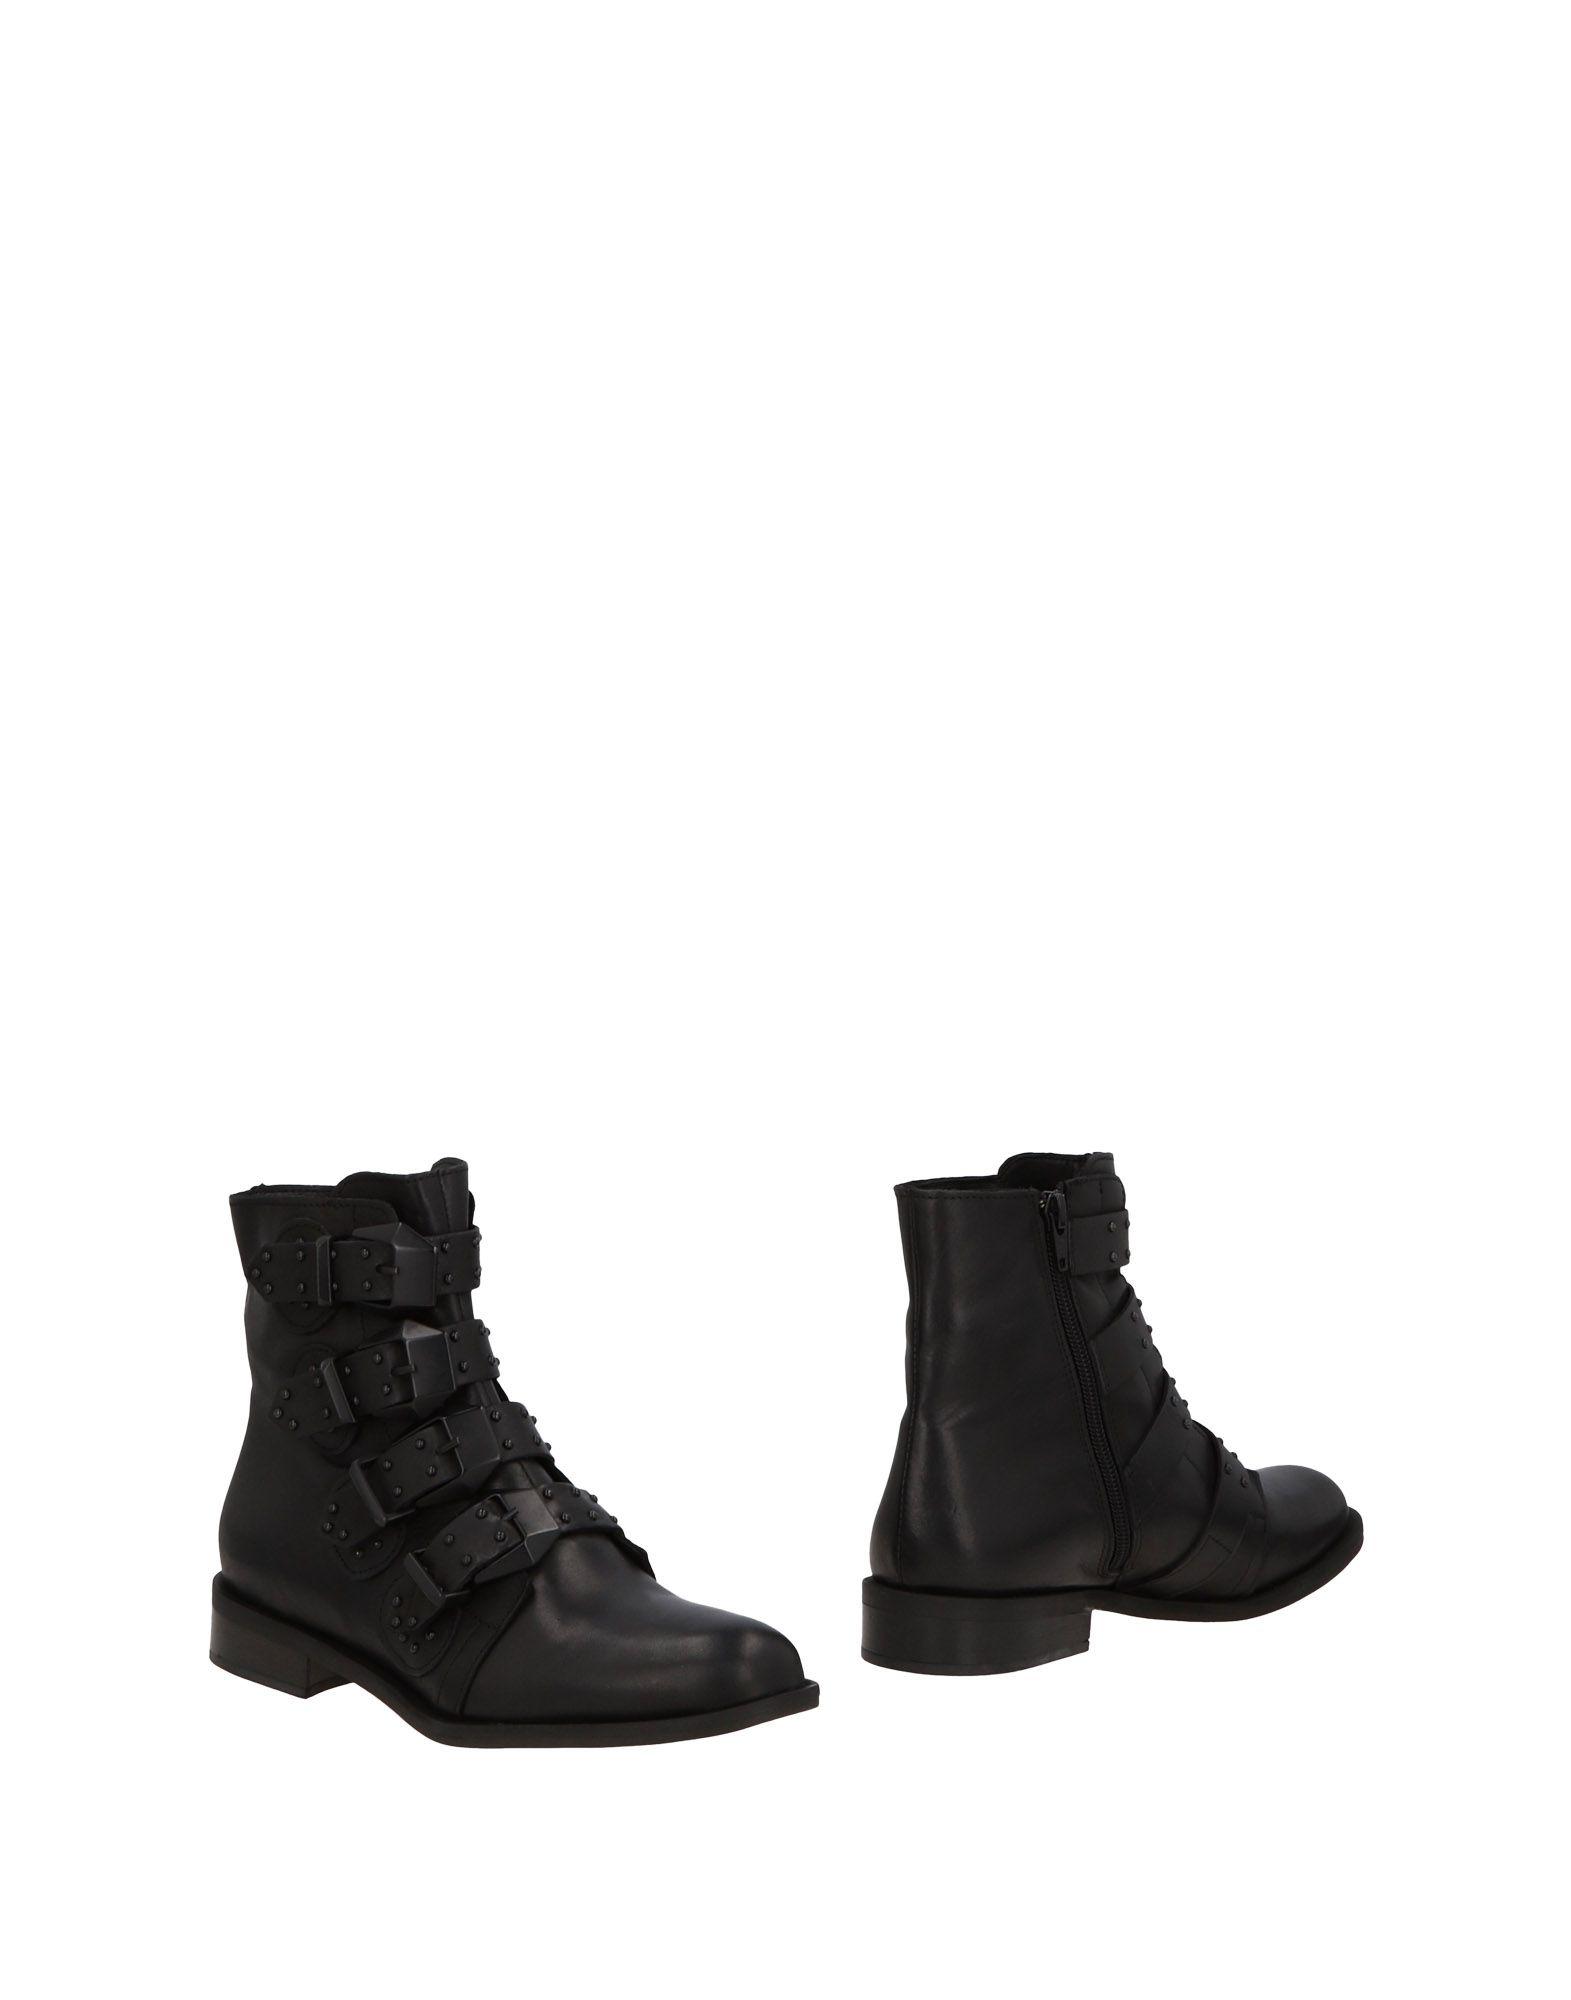 Unlace Stiefelette Damen 11473950QK Gute Qualität beliebte Schuhe ... dff0fd206e